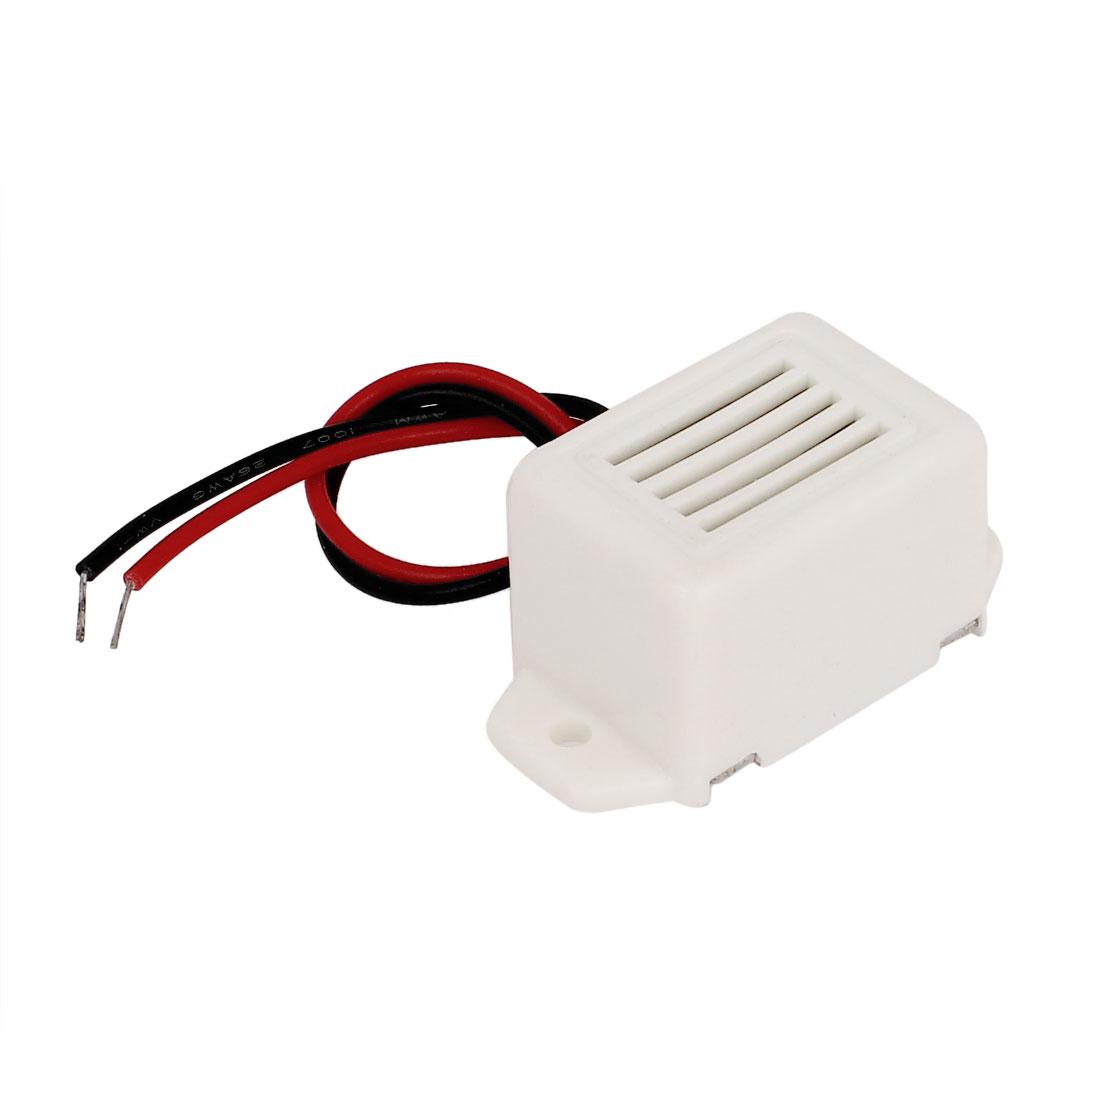 DC 3V Miniature Electronic Effect Tone Sounder Alarm Buzzer Beep White